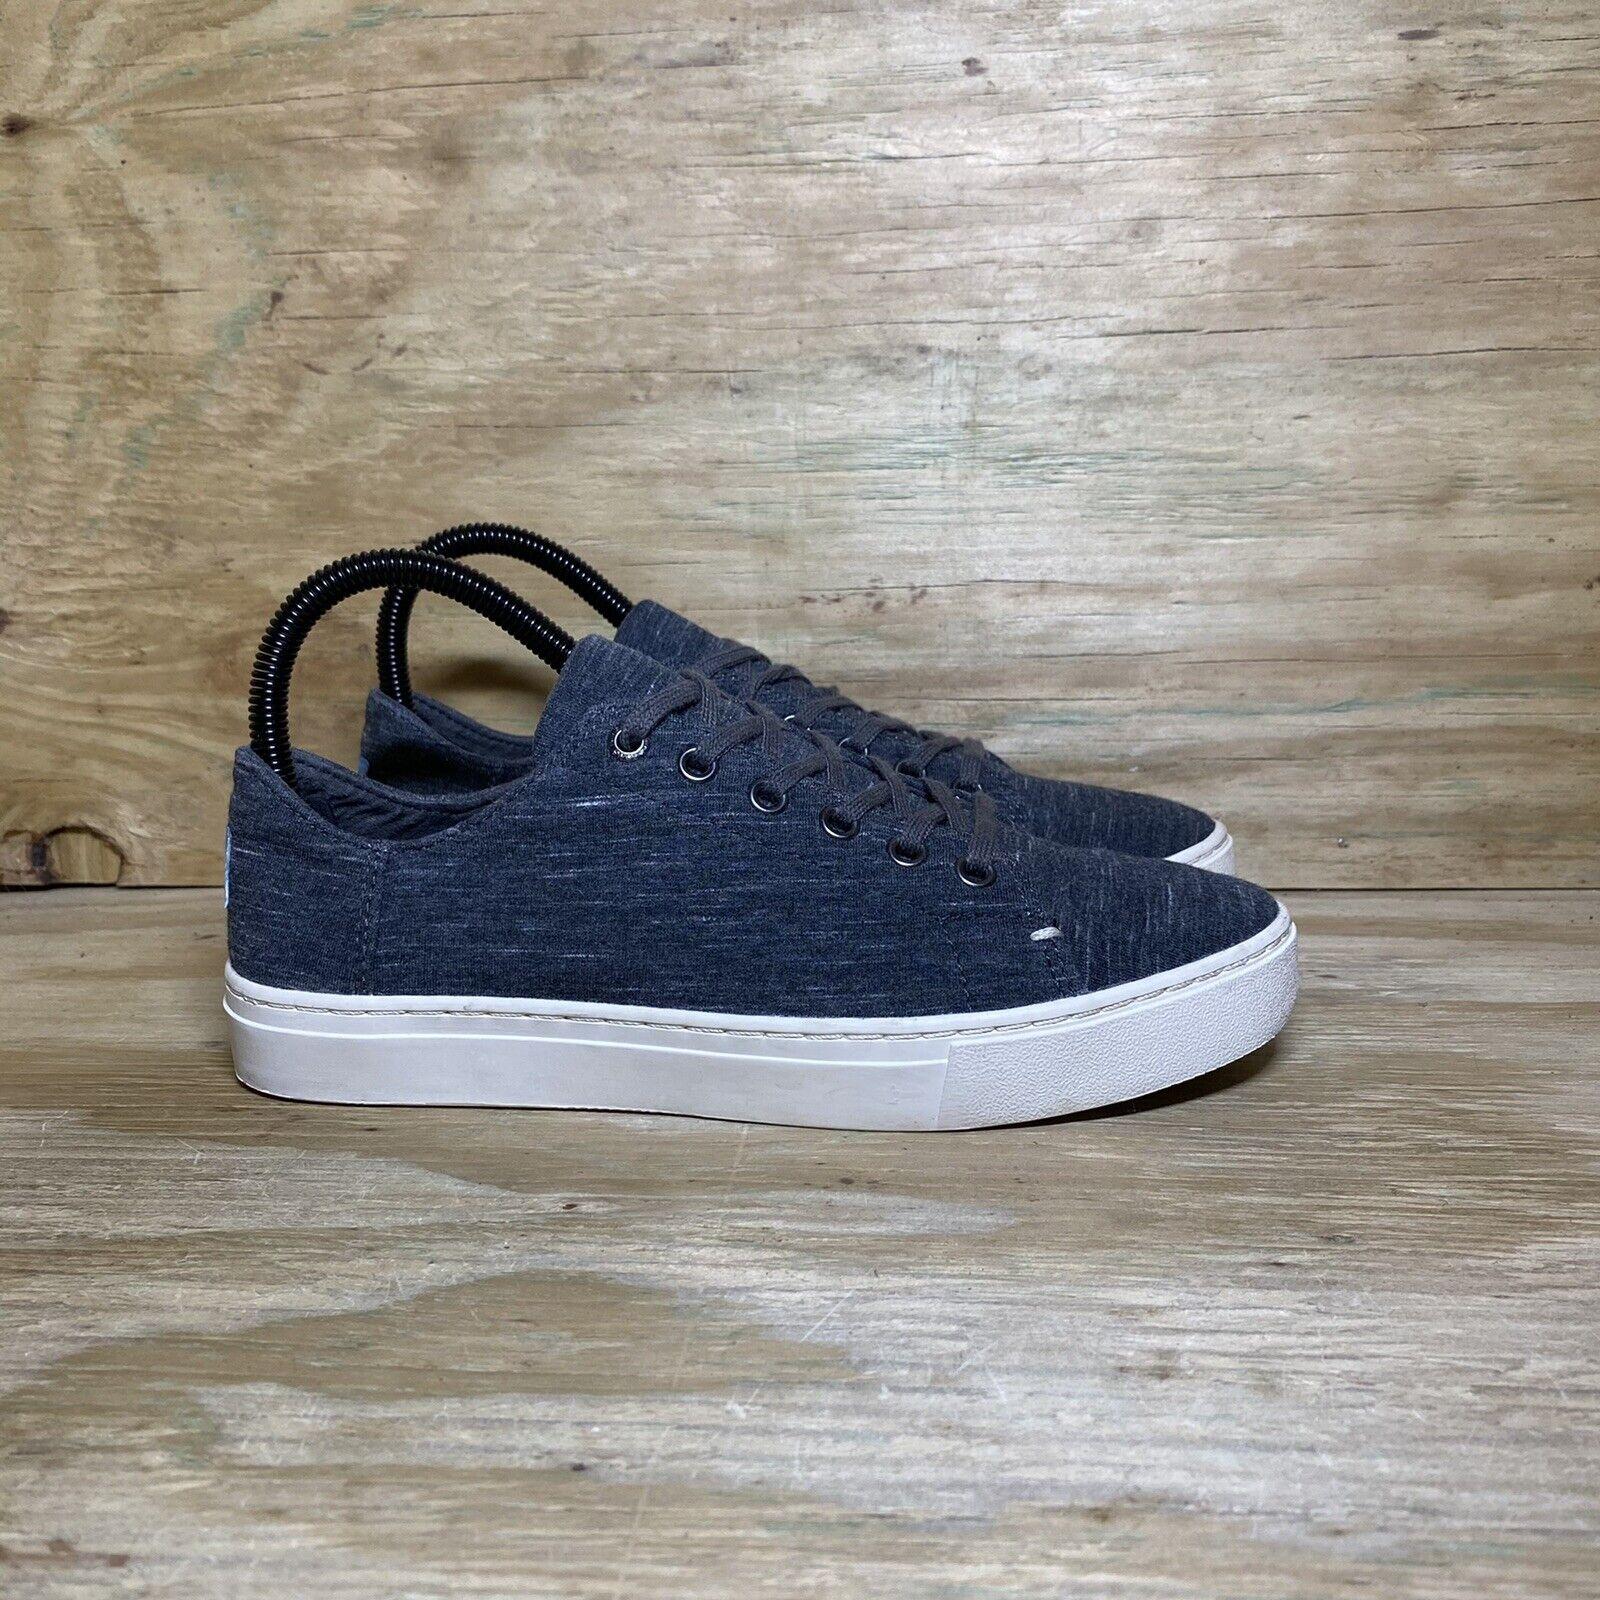 Toms Lenox Fashion Sneakers (10010838), Women's Size 7, Blue